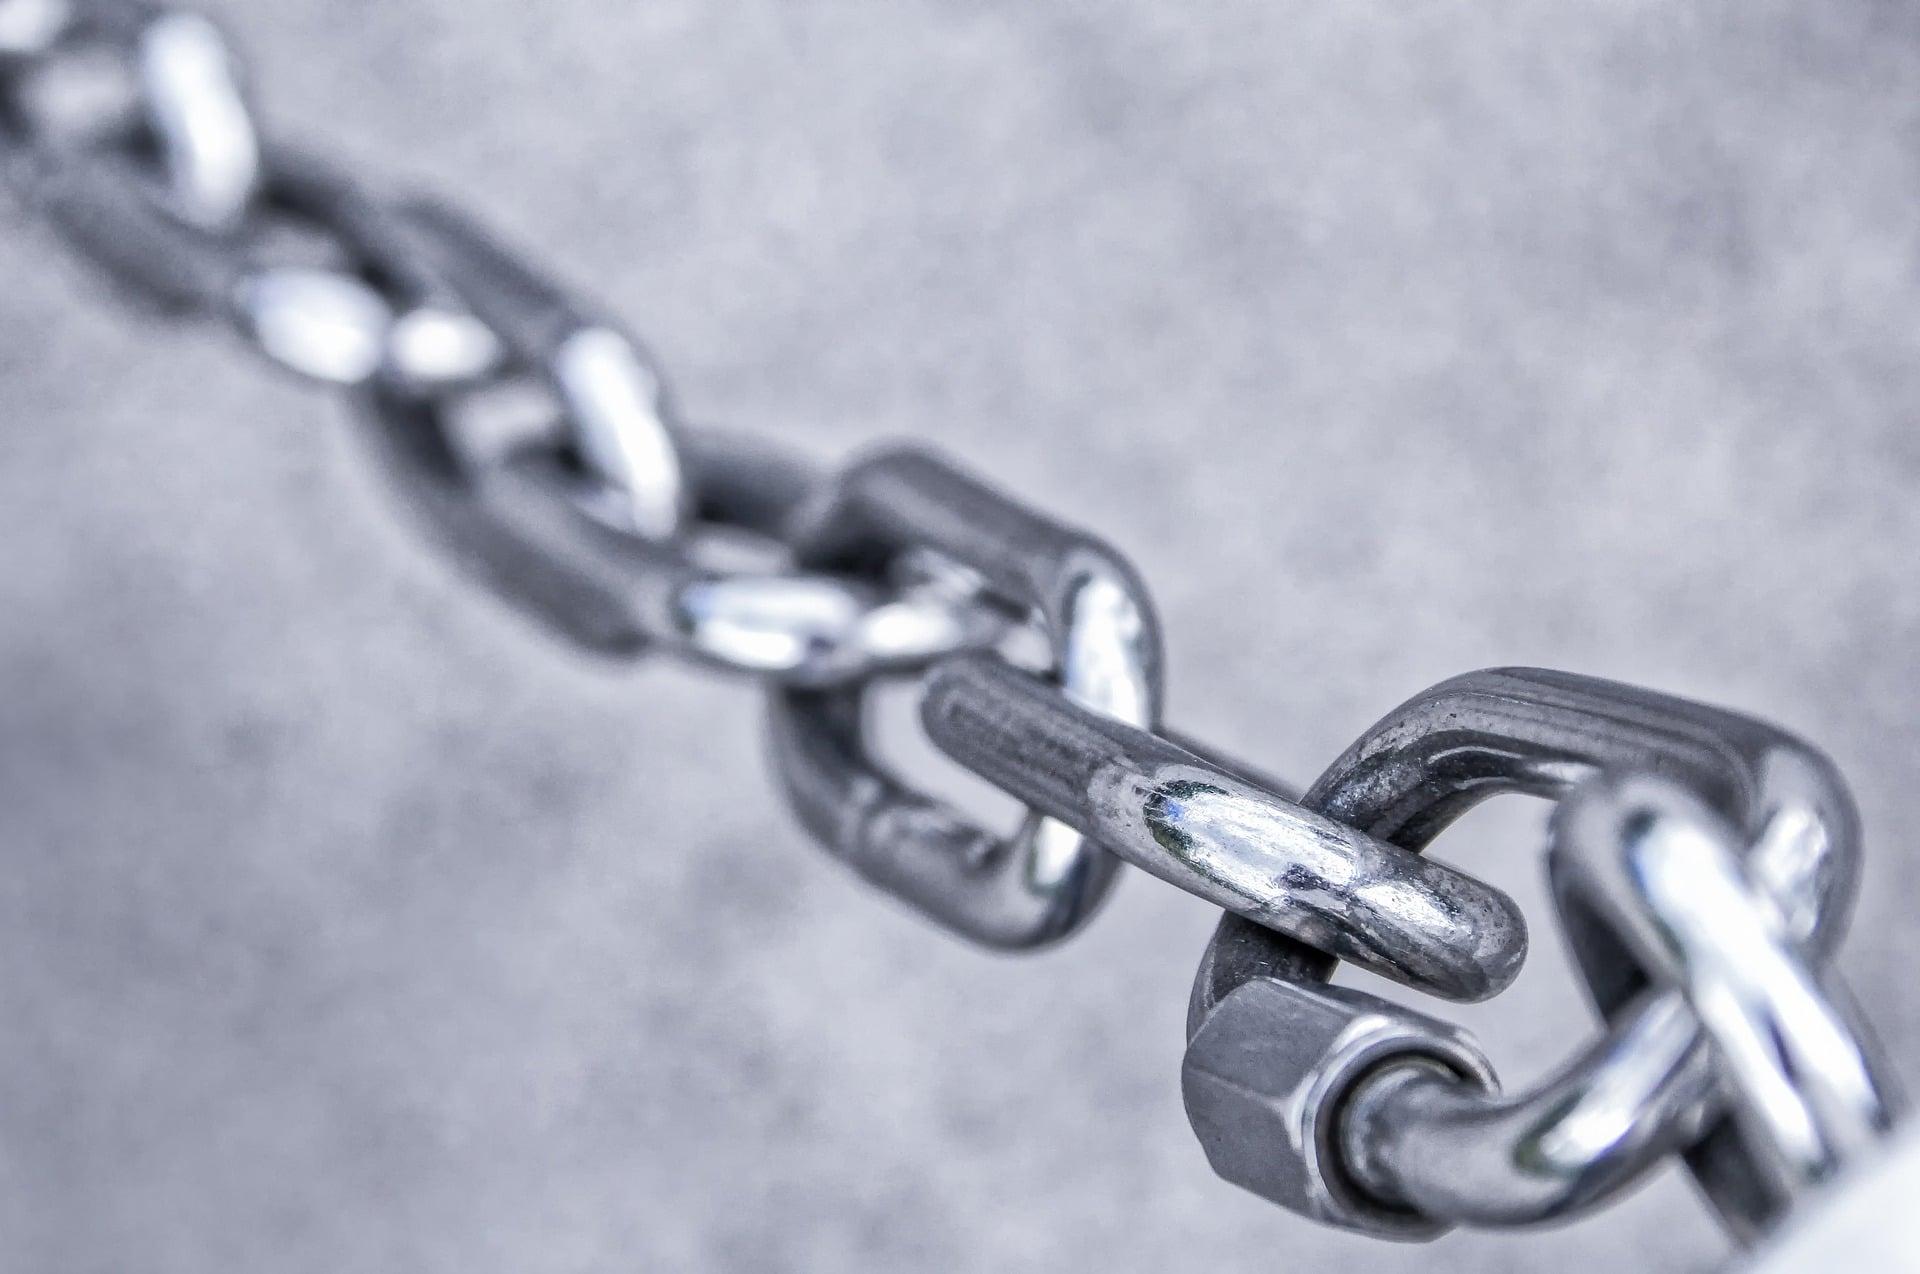 Exploring blockchain-based public procurement to reduce corruption